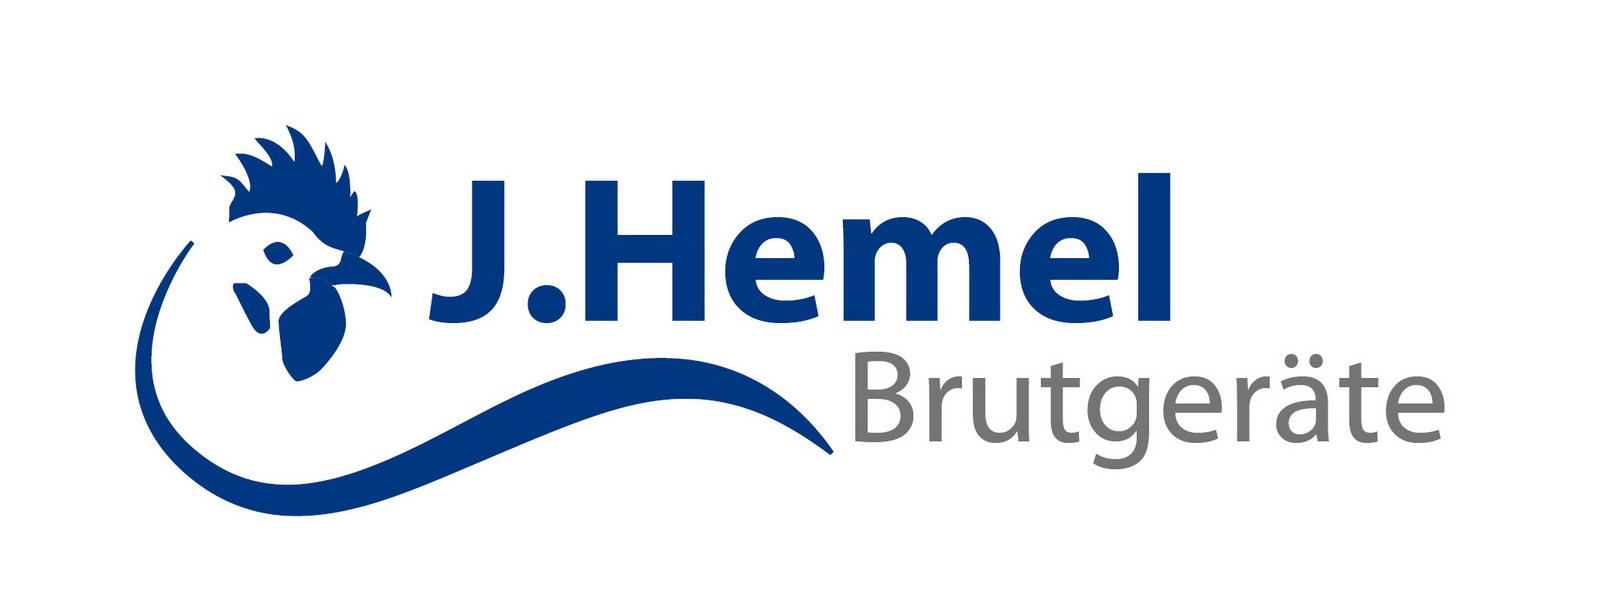 Logo für Hemel Brutgeräte